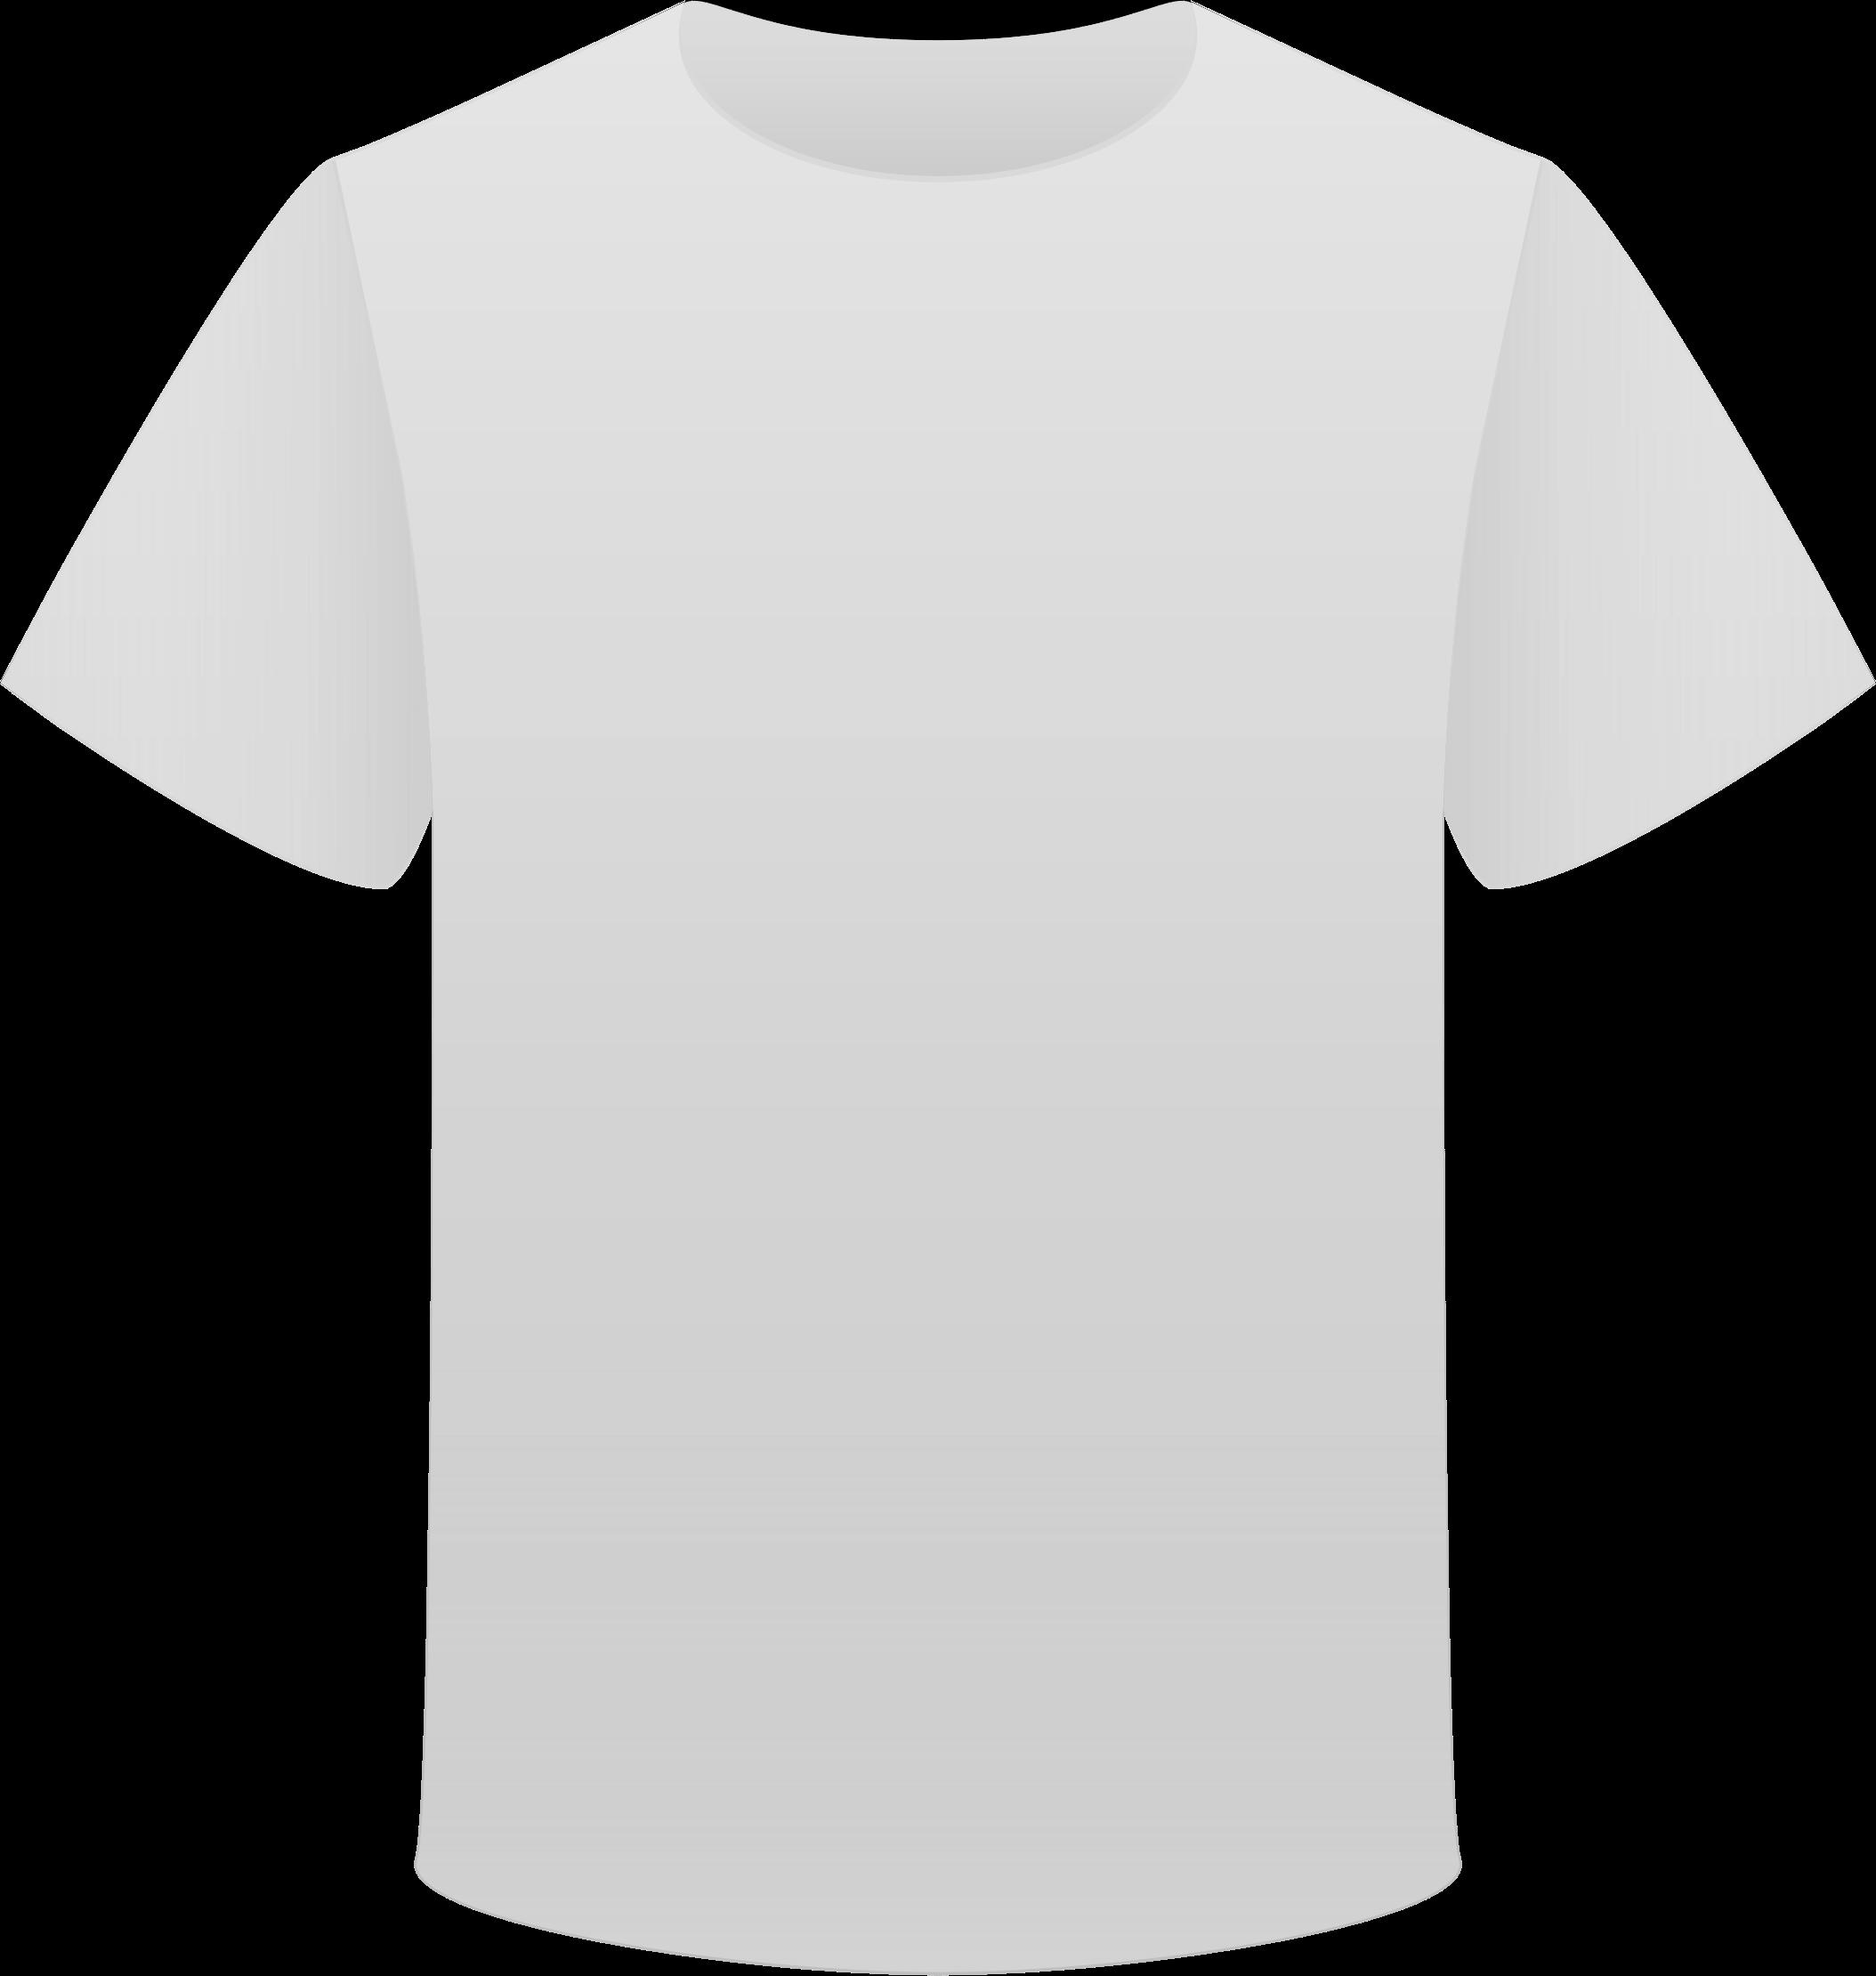 Tshirt White Clipart transparent PNG.